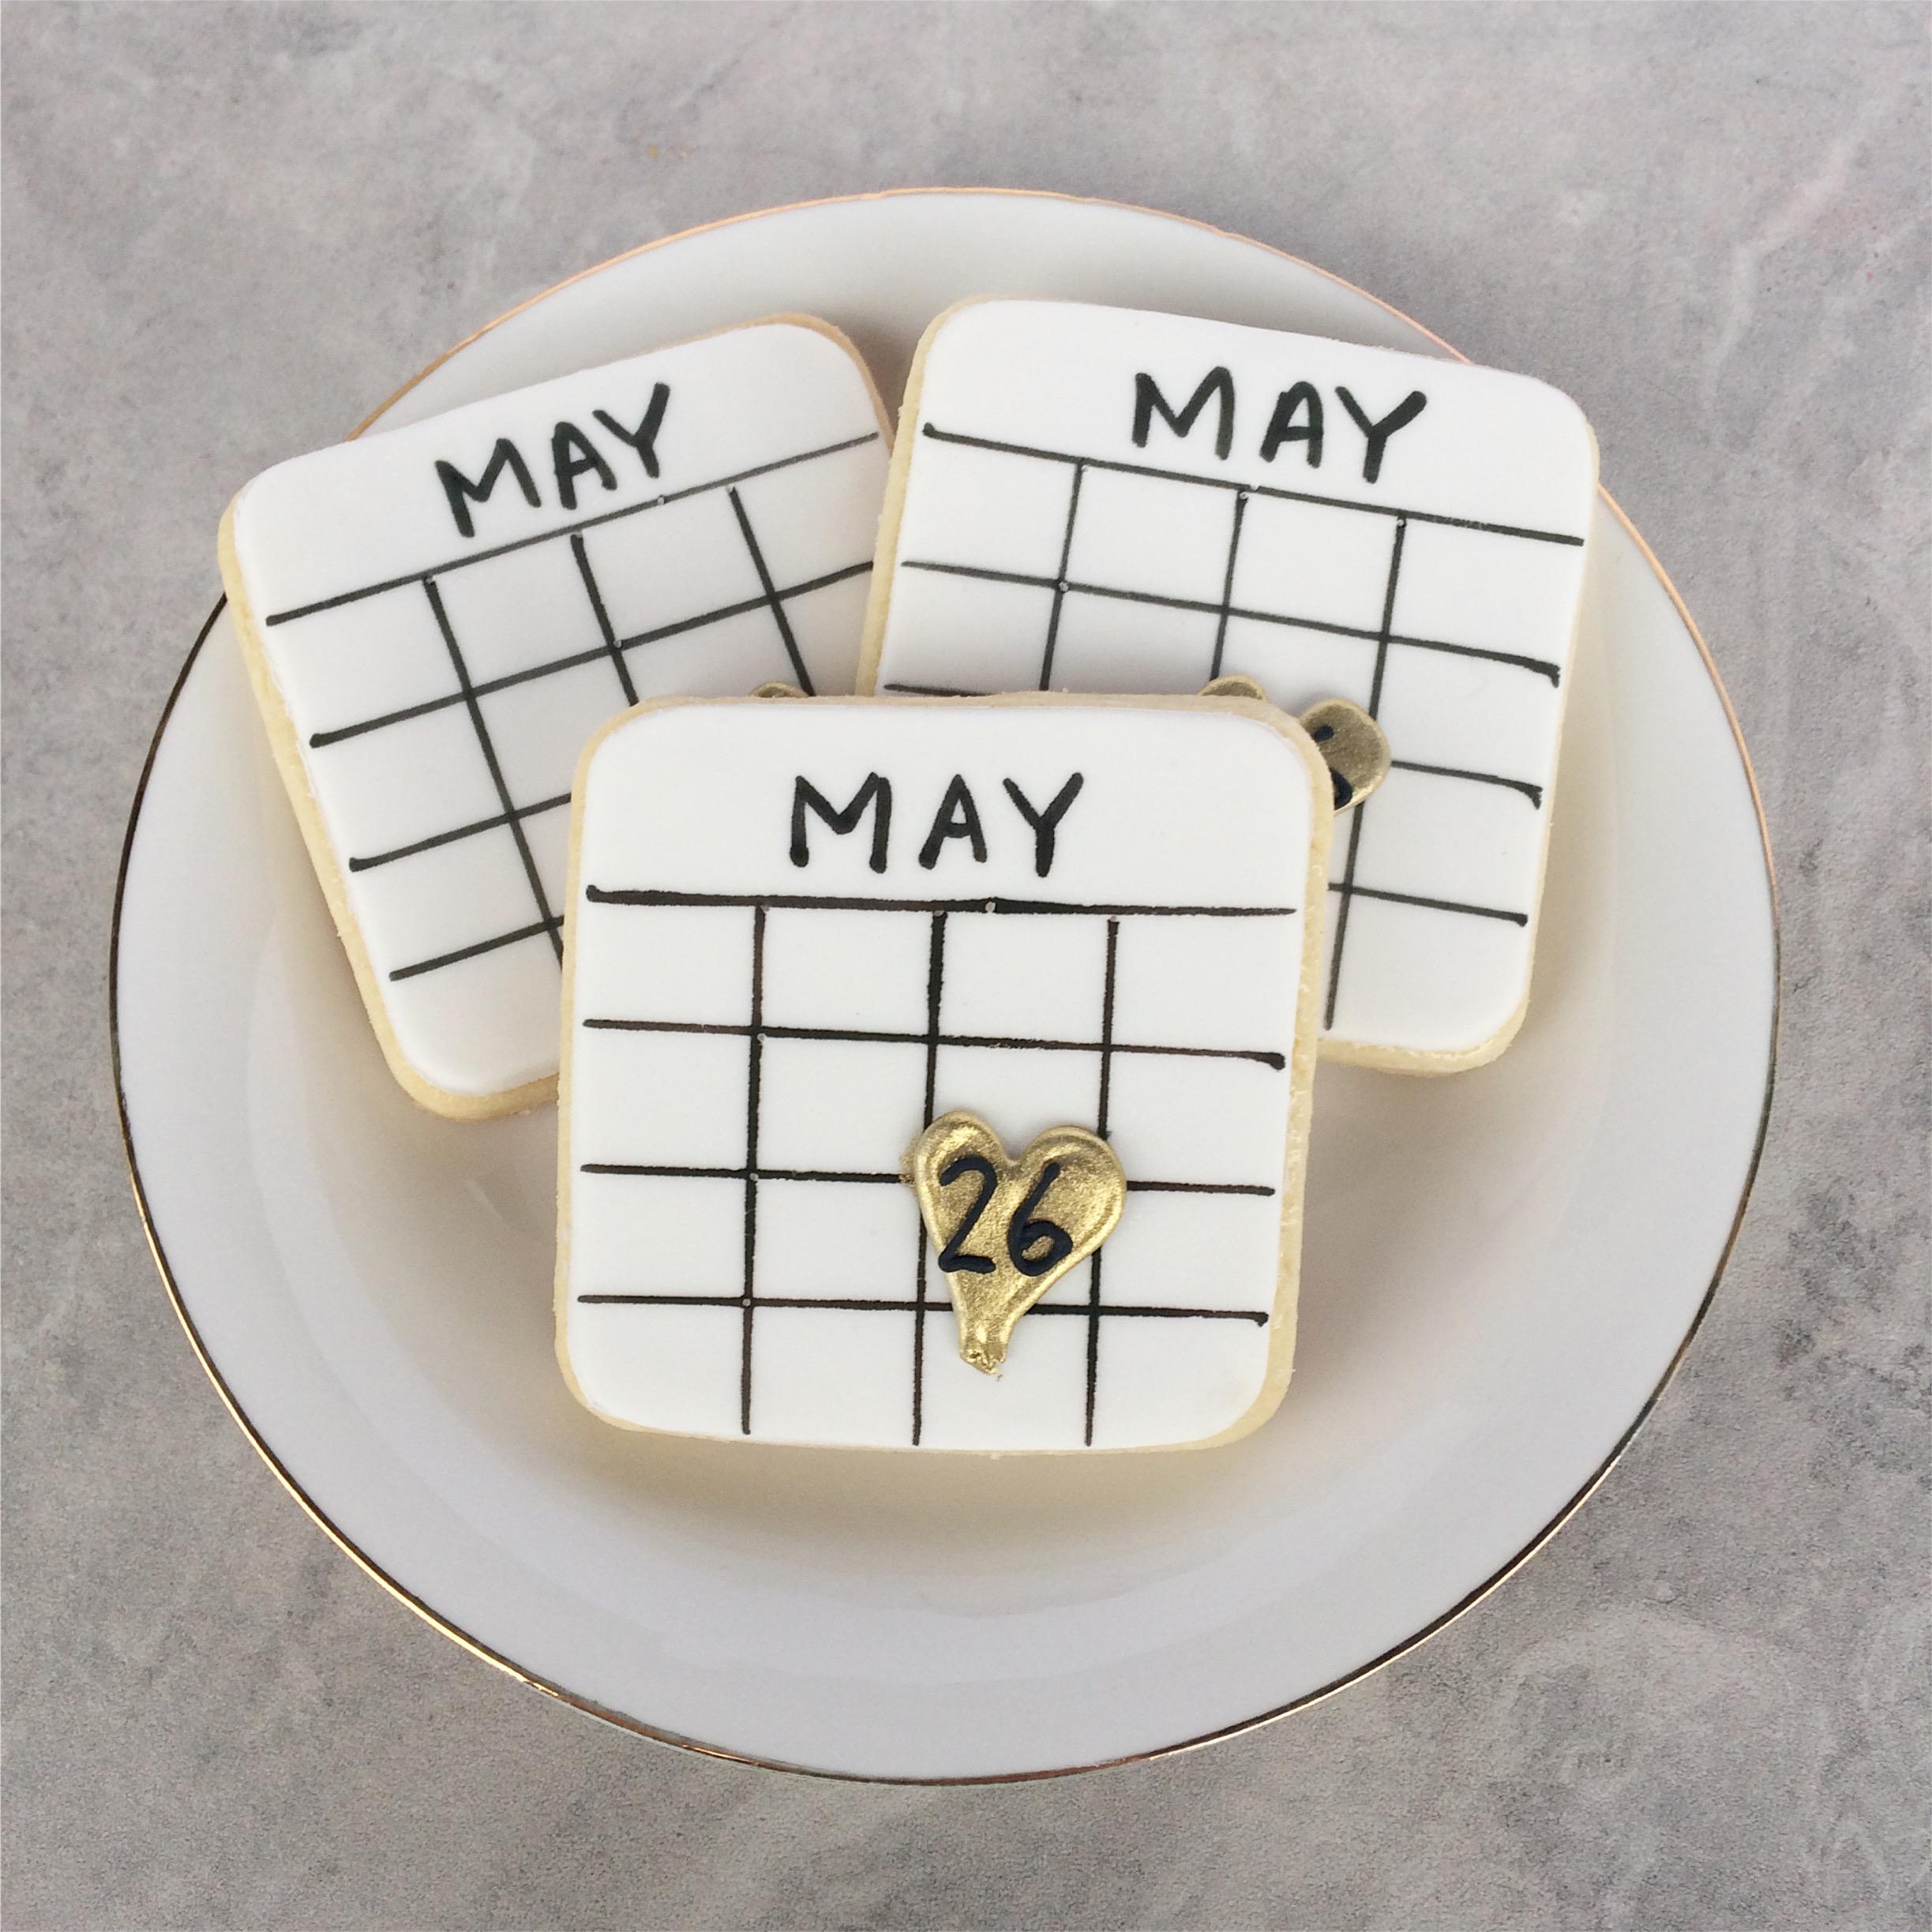 Sauvez la date!